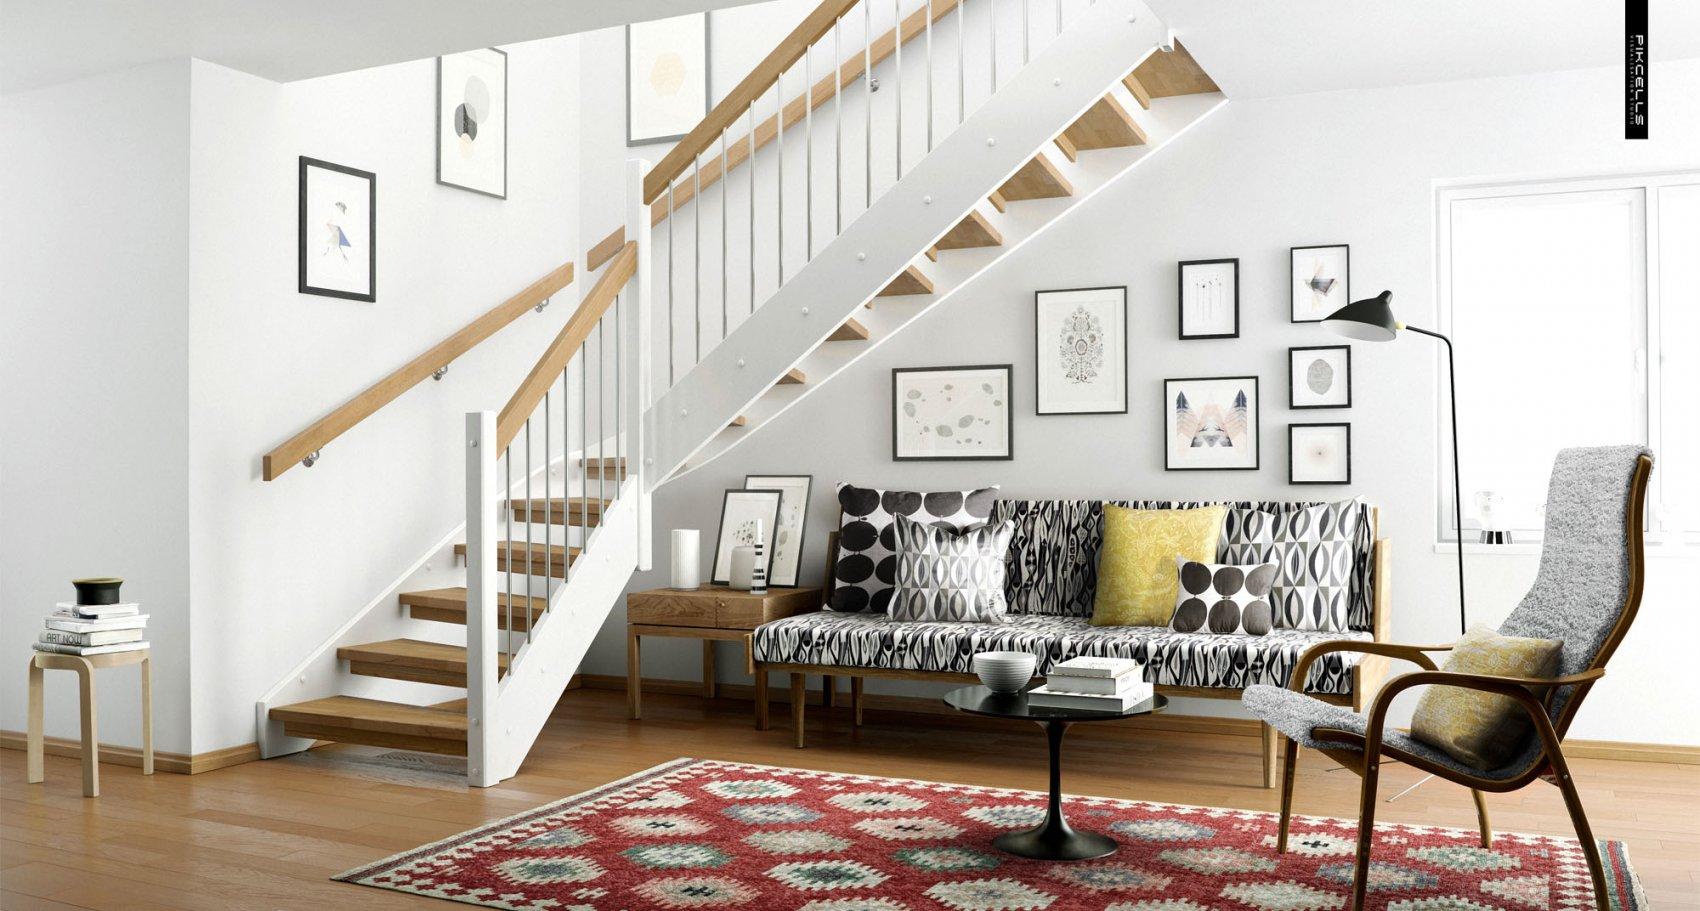 Chic Dcor Living Room Interior Design Interior Design Ideas Living Room Any Style Swedish Living Room Living Room Furniture Ideas interior Traditional Living Room Interior Design